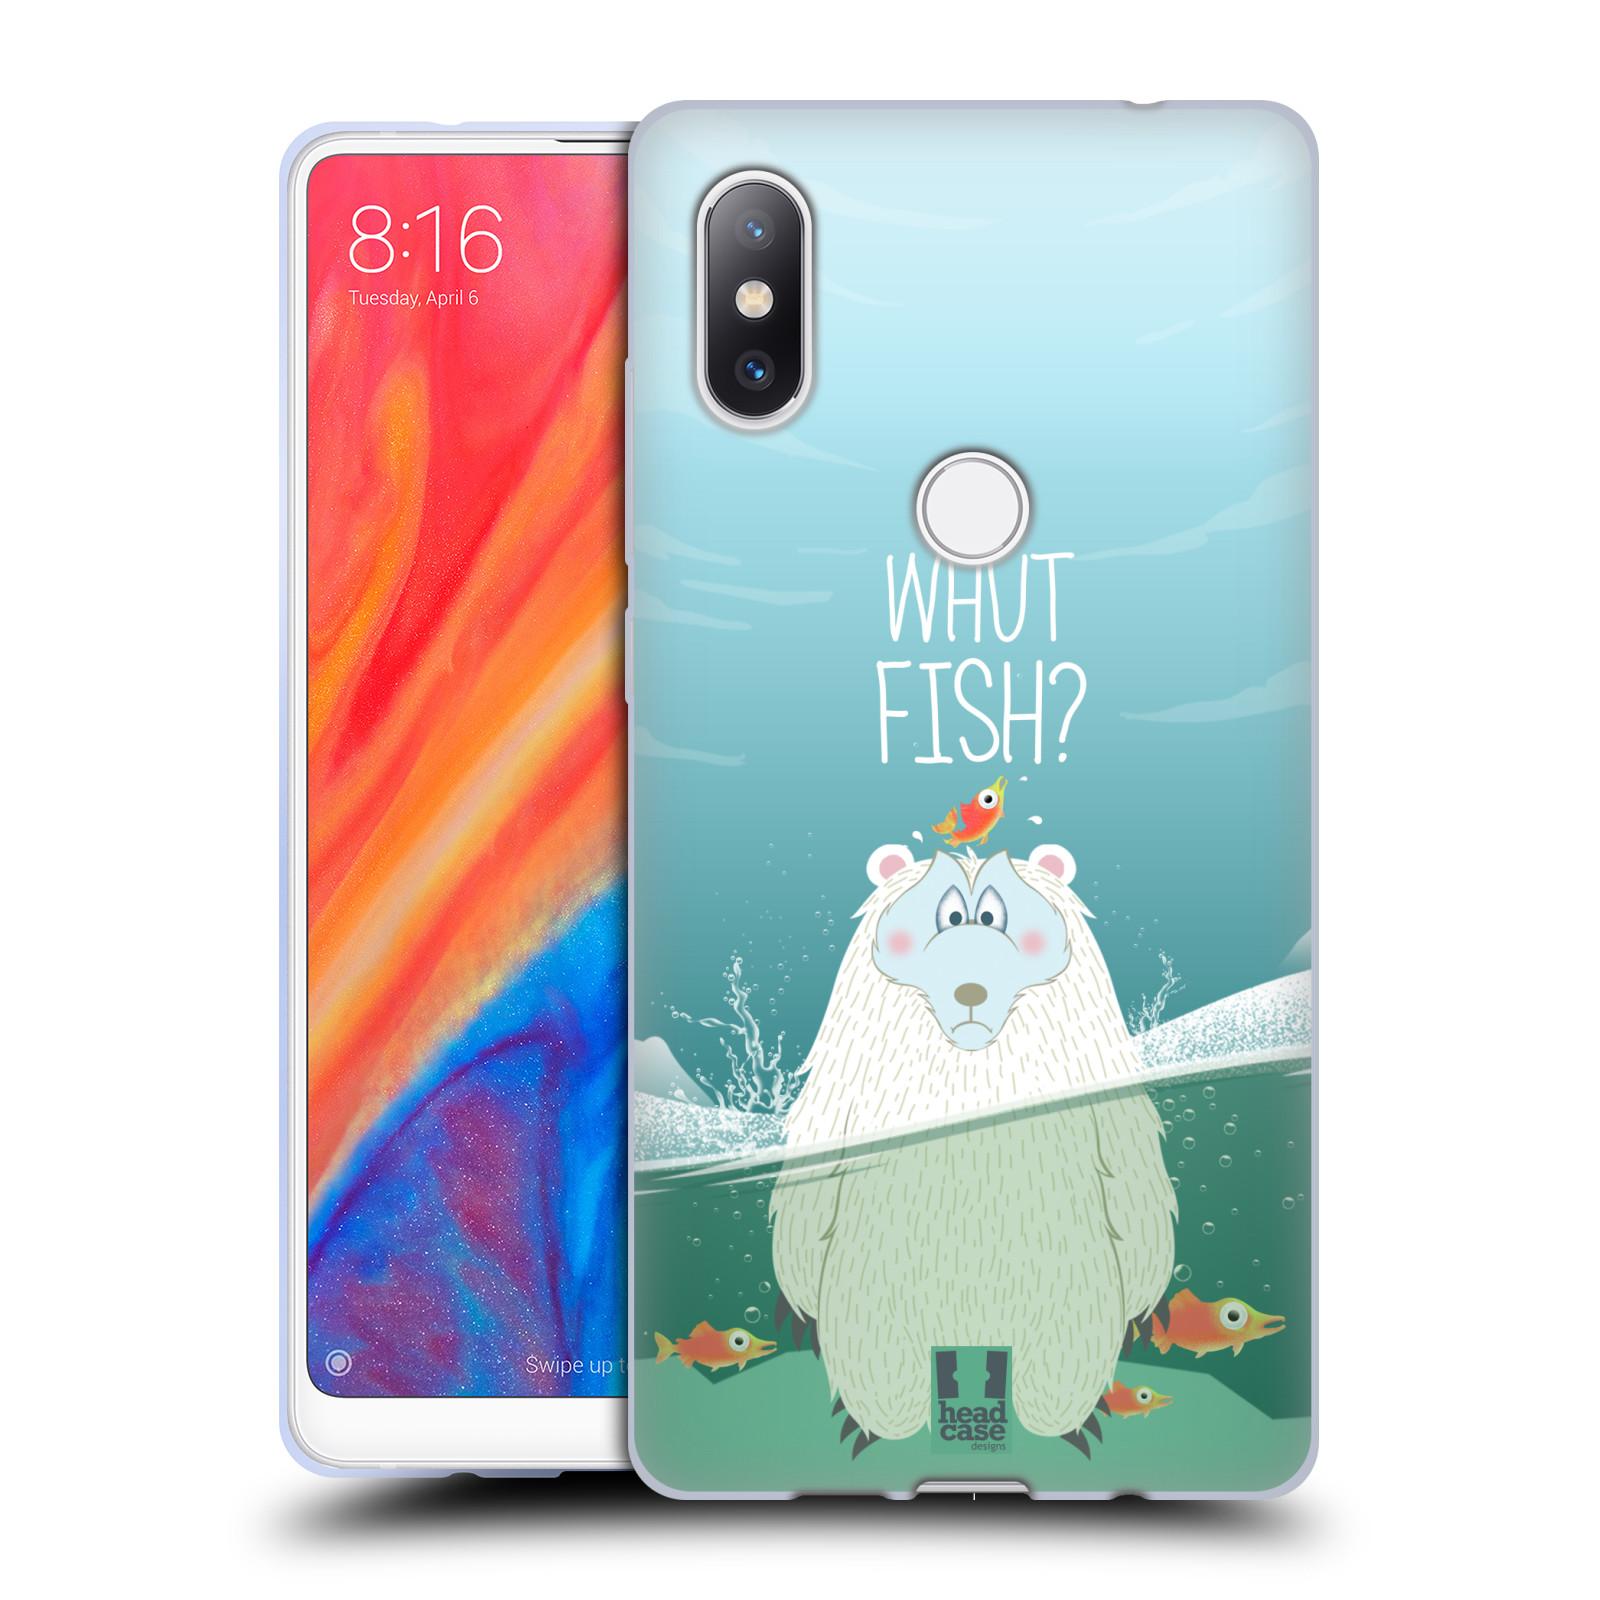 Silikonové pouzdro na mobil Xiaomi Mi Mix 2S - Head Case - Medvěd Whut Fish?